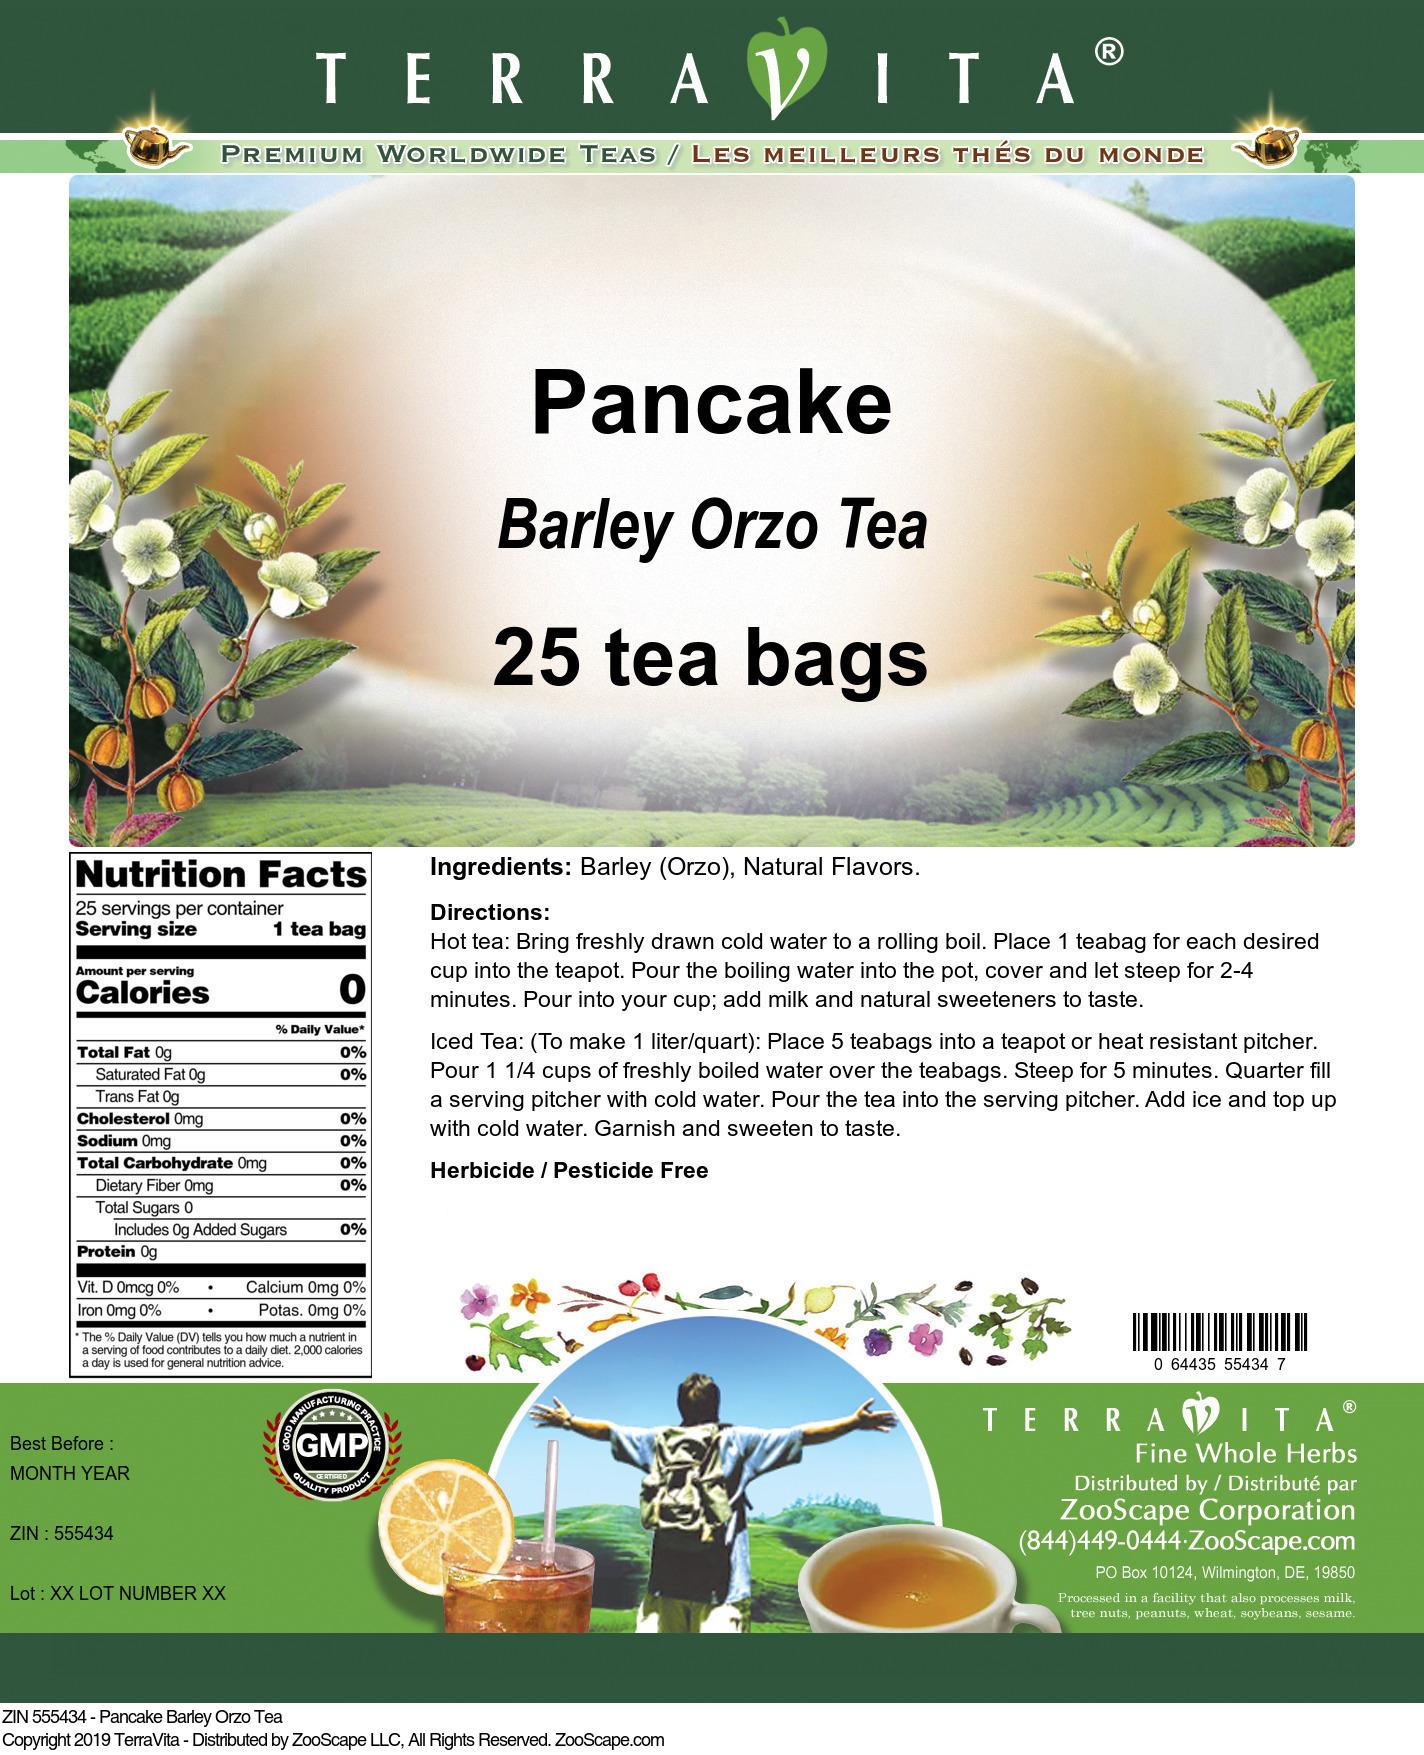 Pancake Barley Orzo